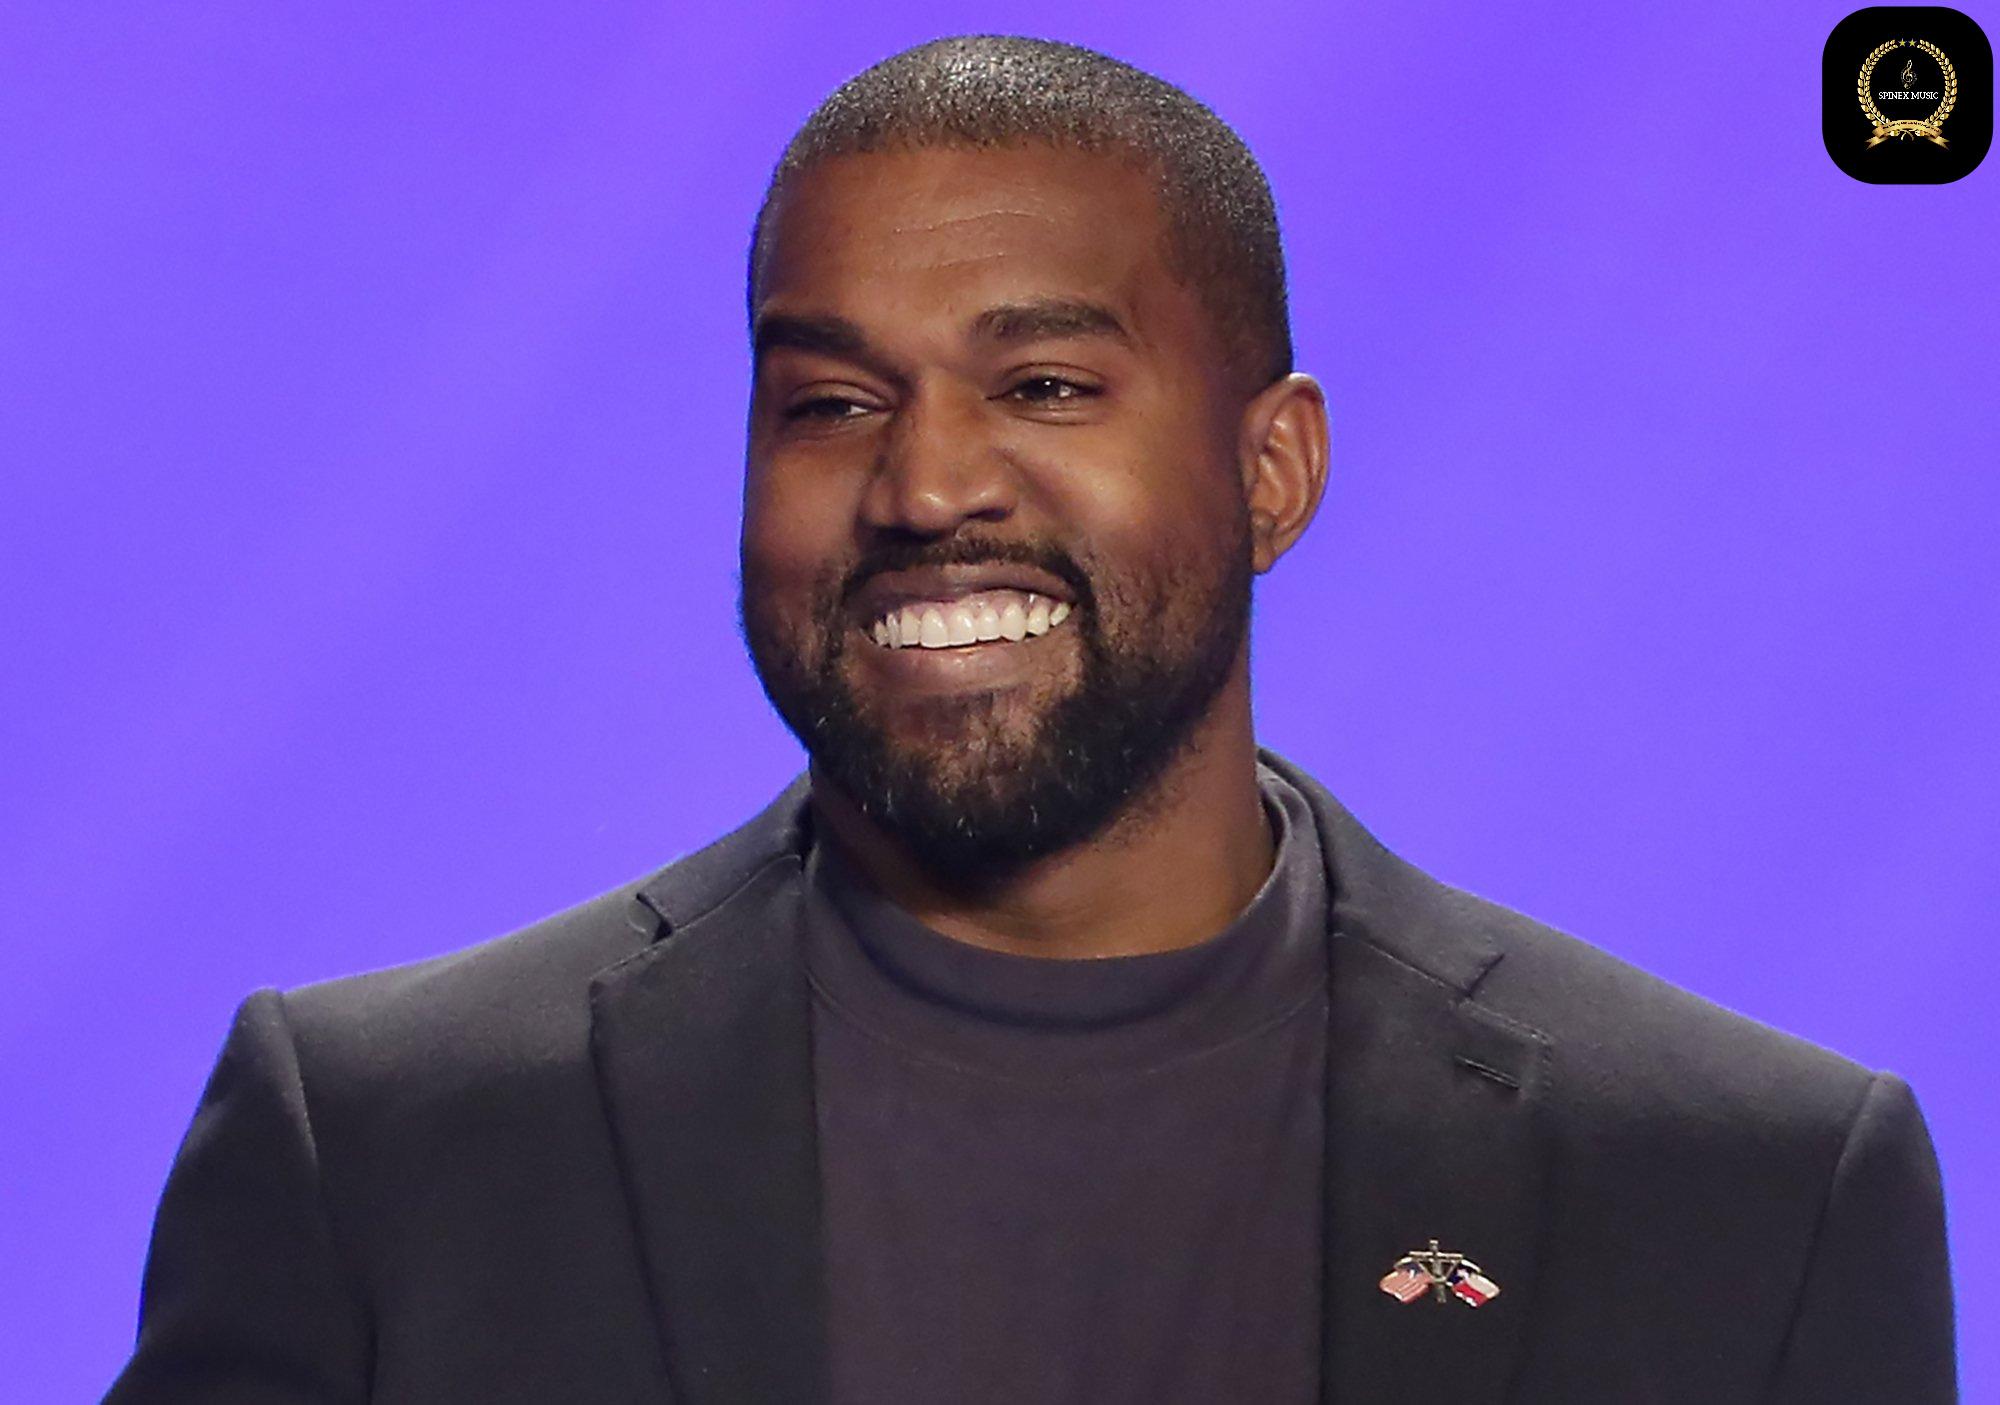 kanye west worth 6.6 billion dollars